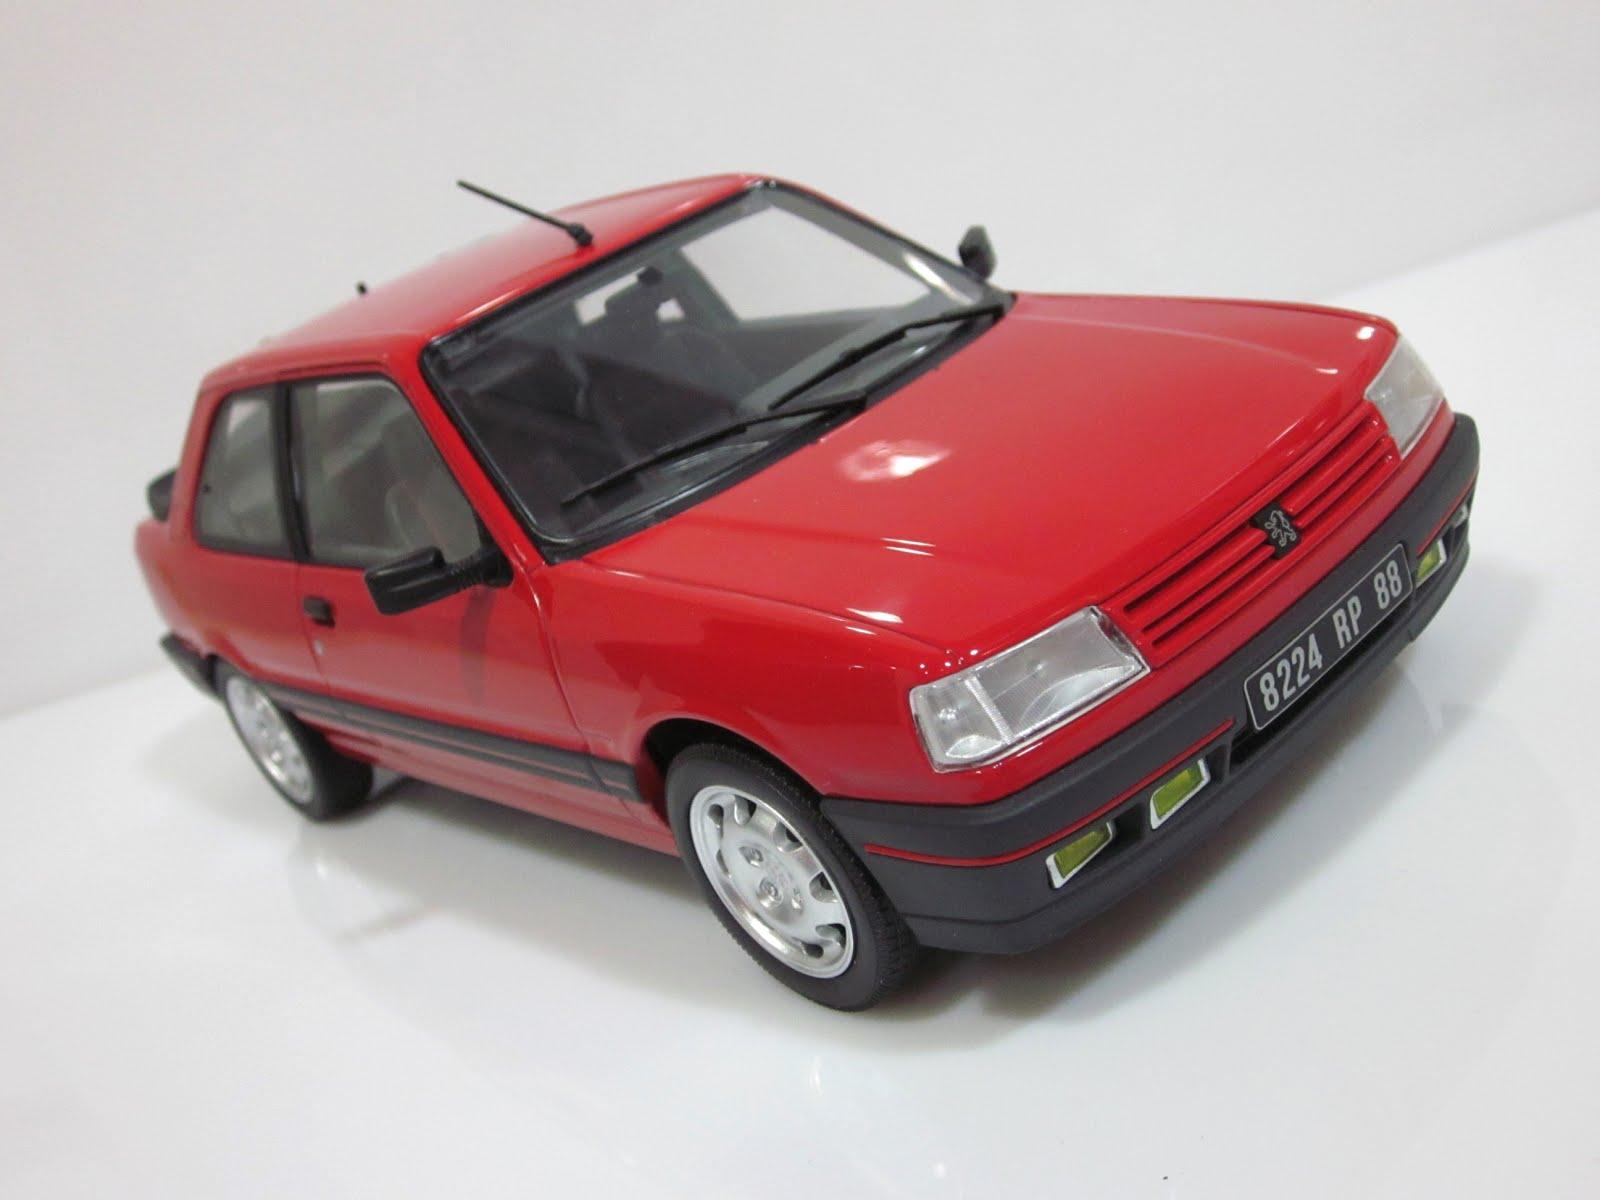 Peugeot 309 GTI - Norev